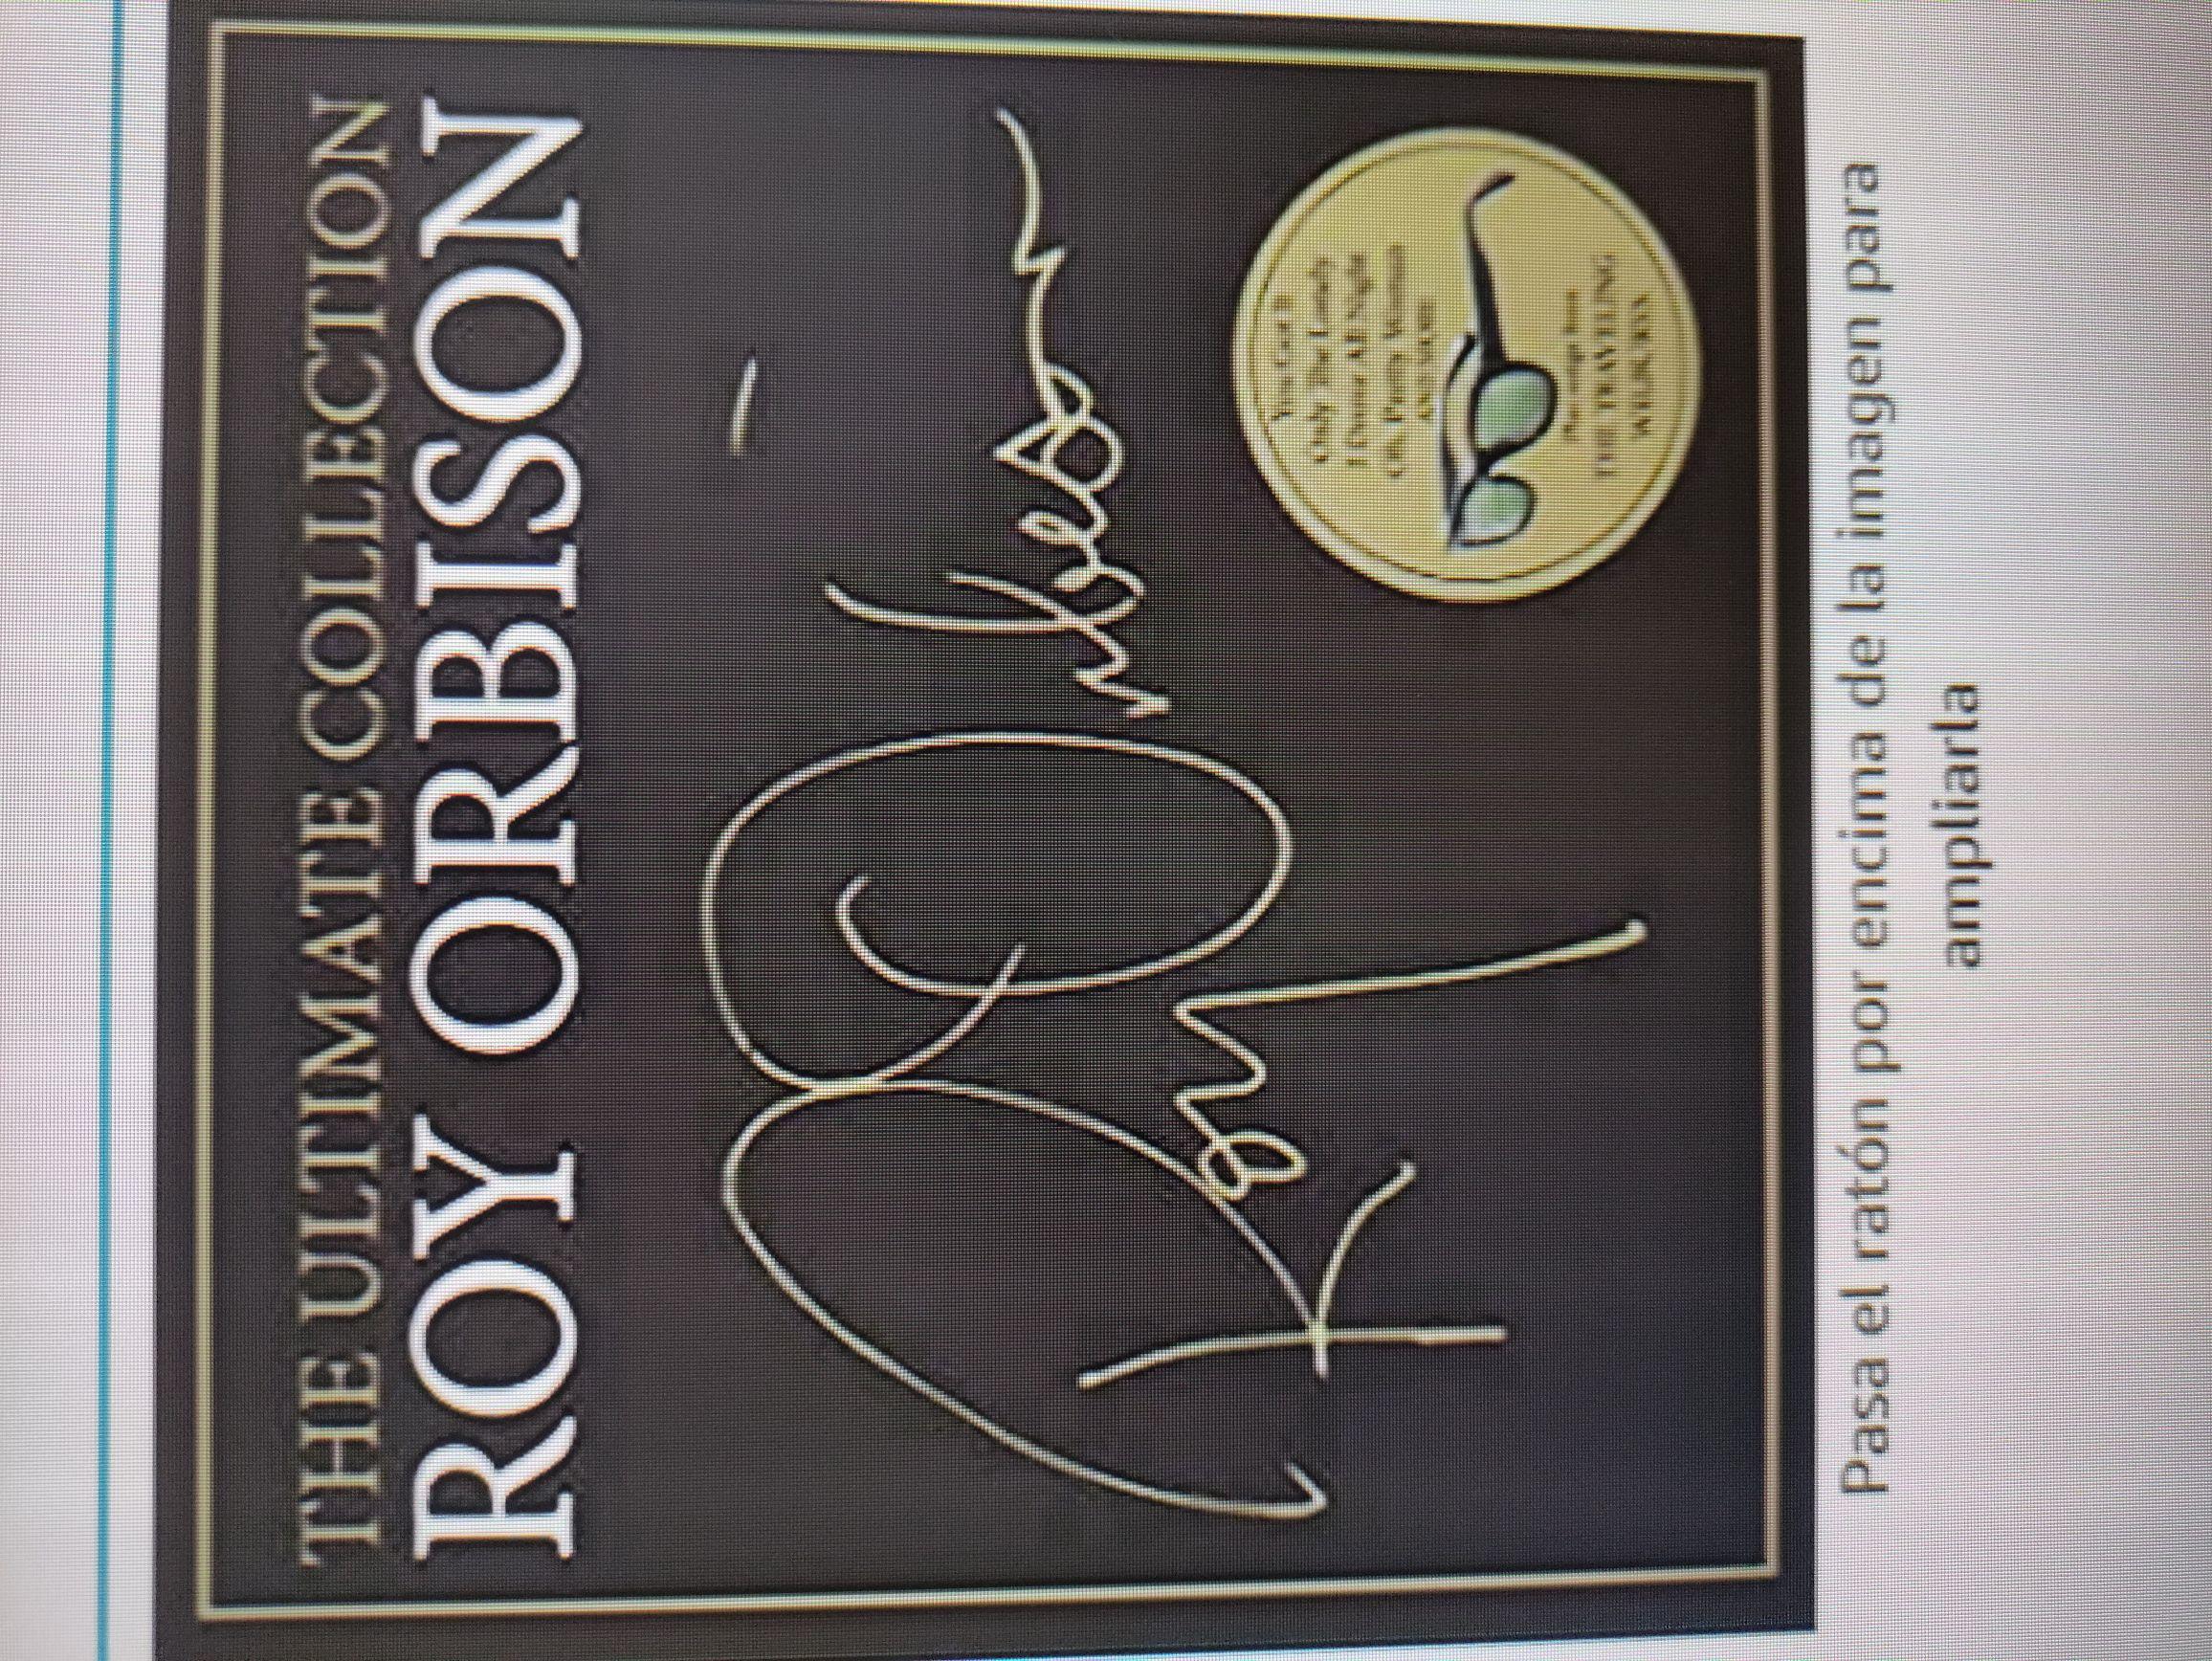 Vinilo: The Ultimate Roy Orbison